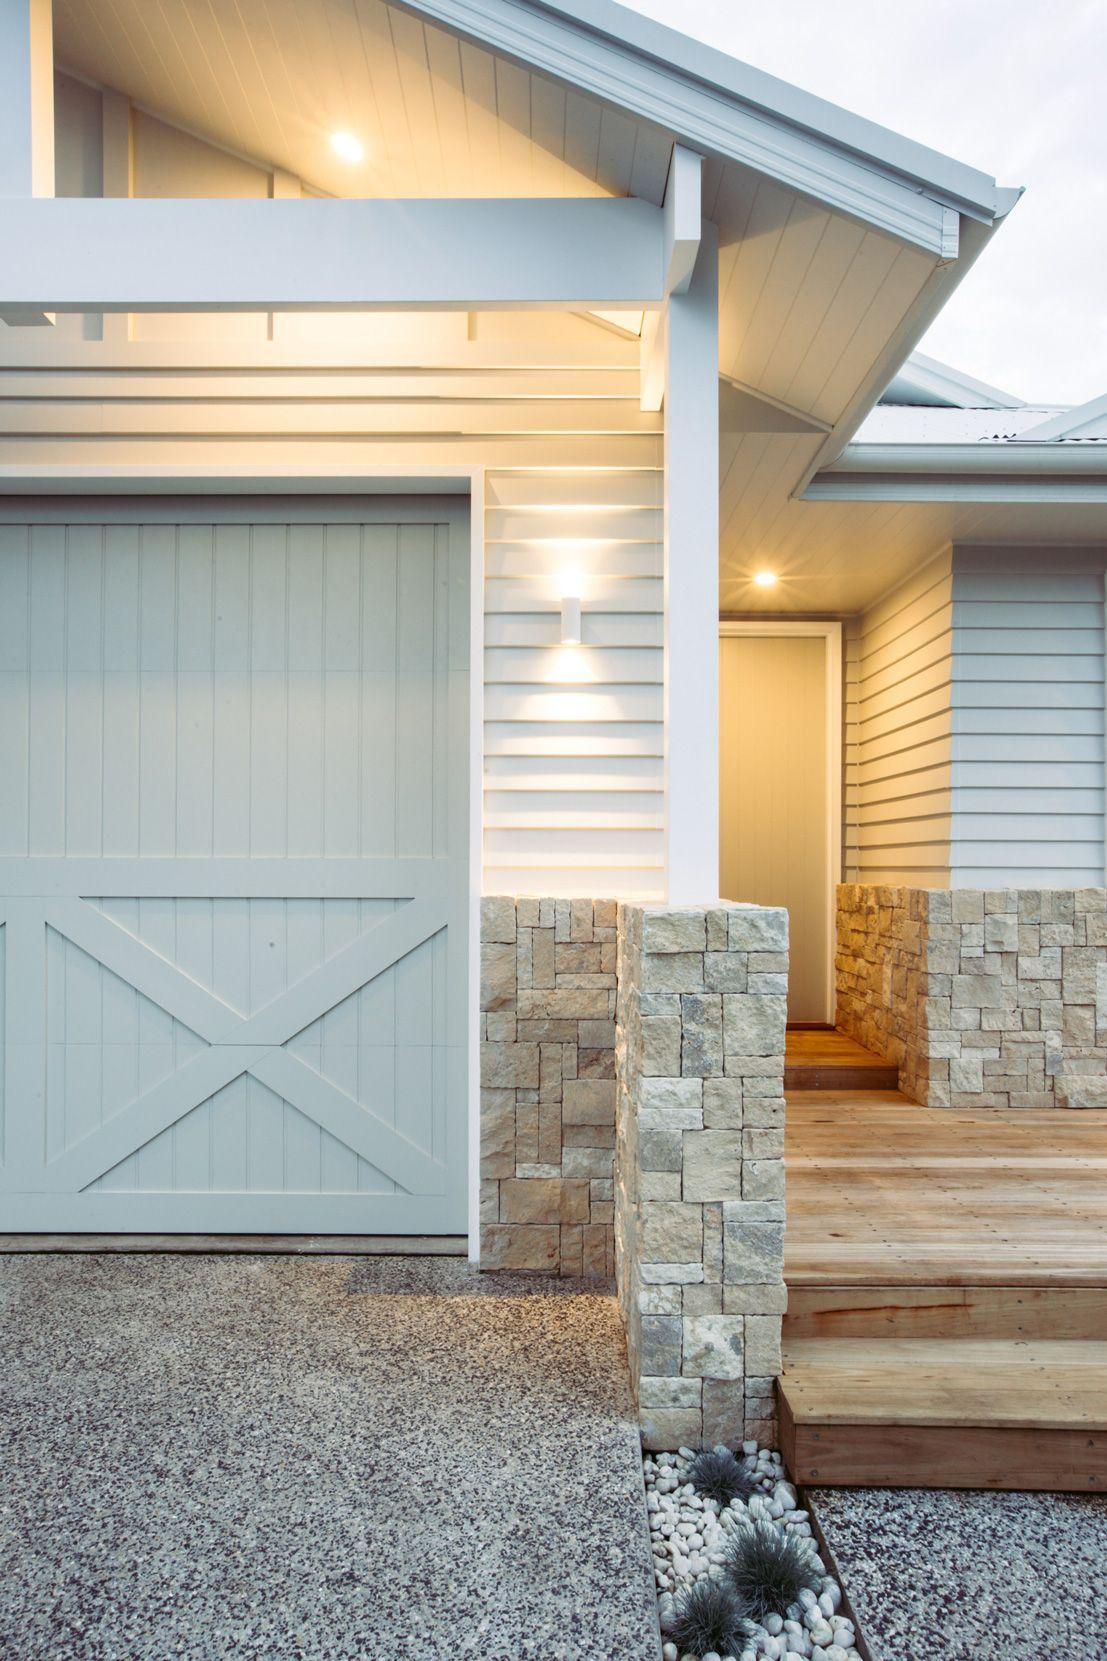 10 Blindsiding Cool Tips Chic Coastal Decor Coastal Crafts Bathroom Coastal Office Dreams Coasta Hamptons House Exterior Weatherboard House Garage Door Colors